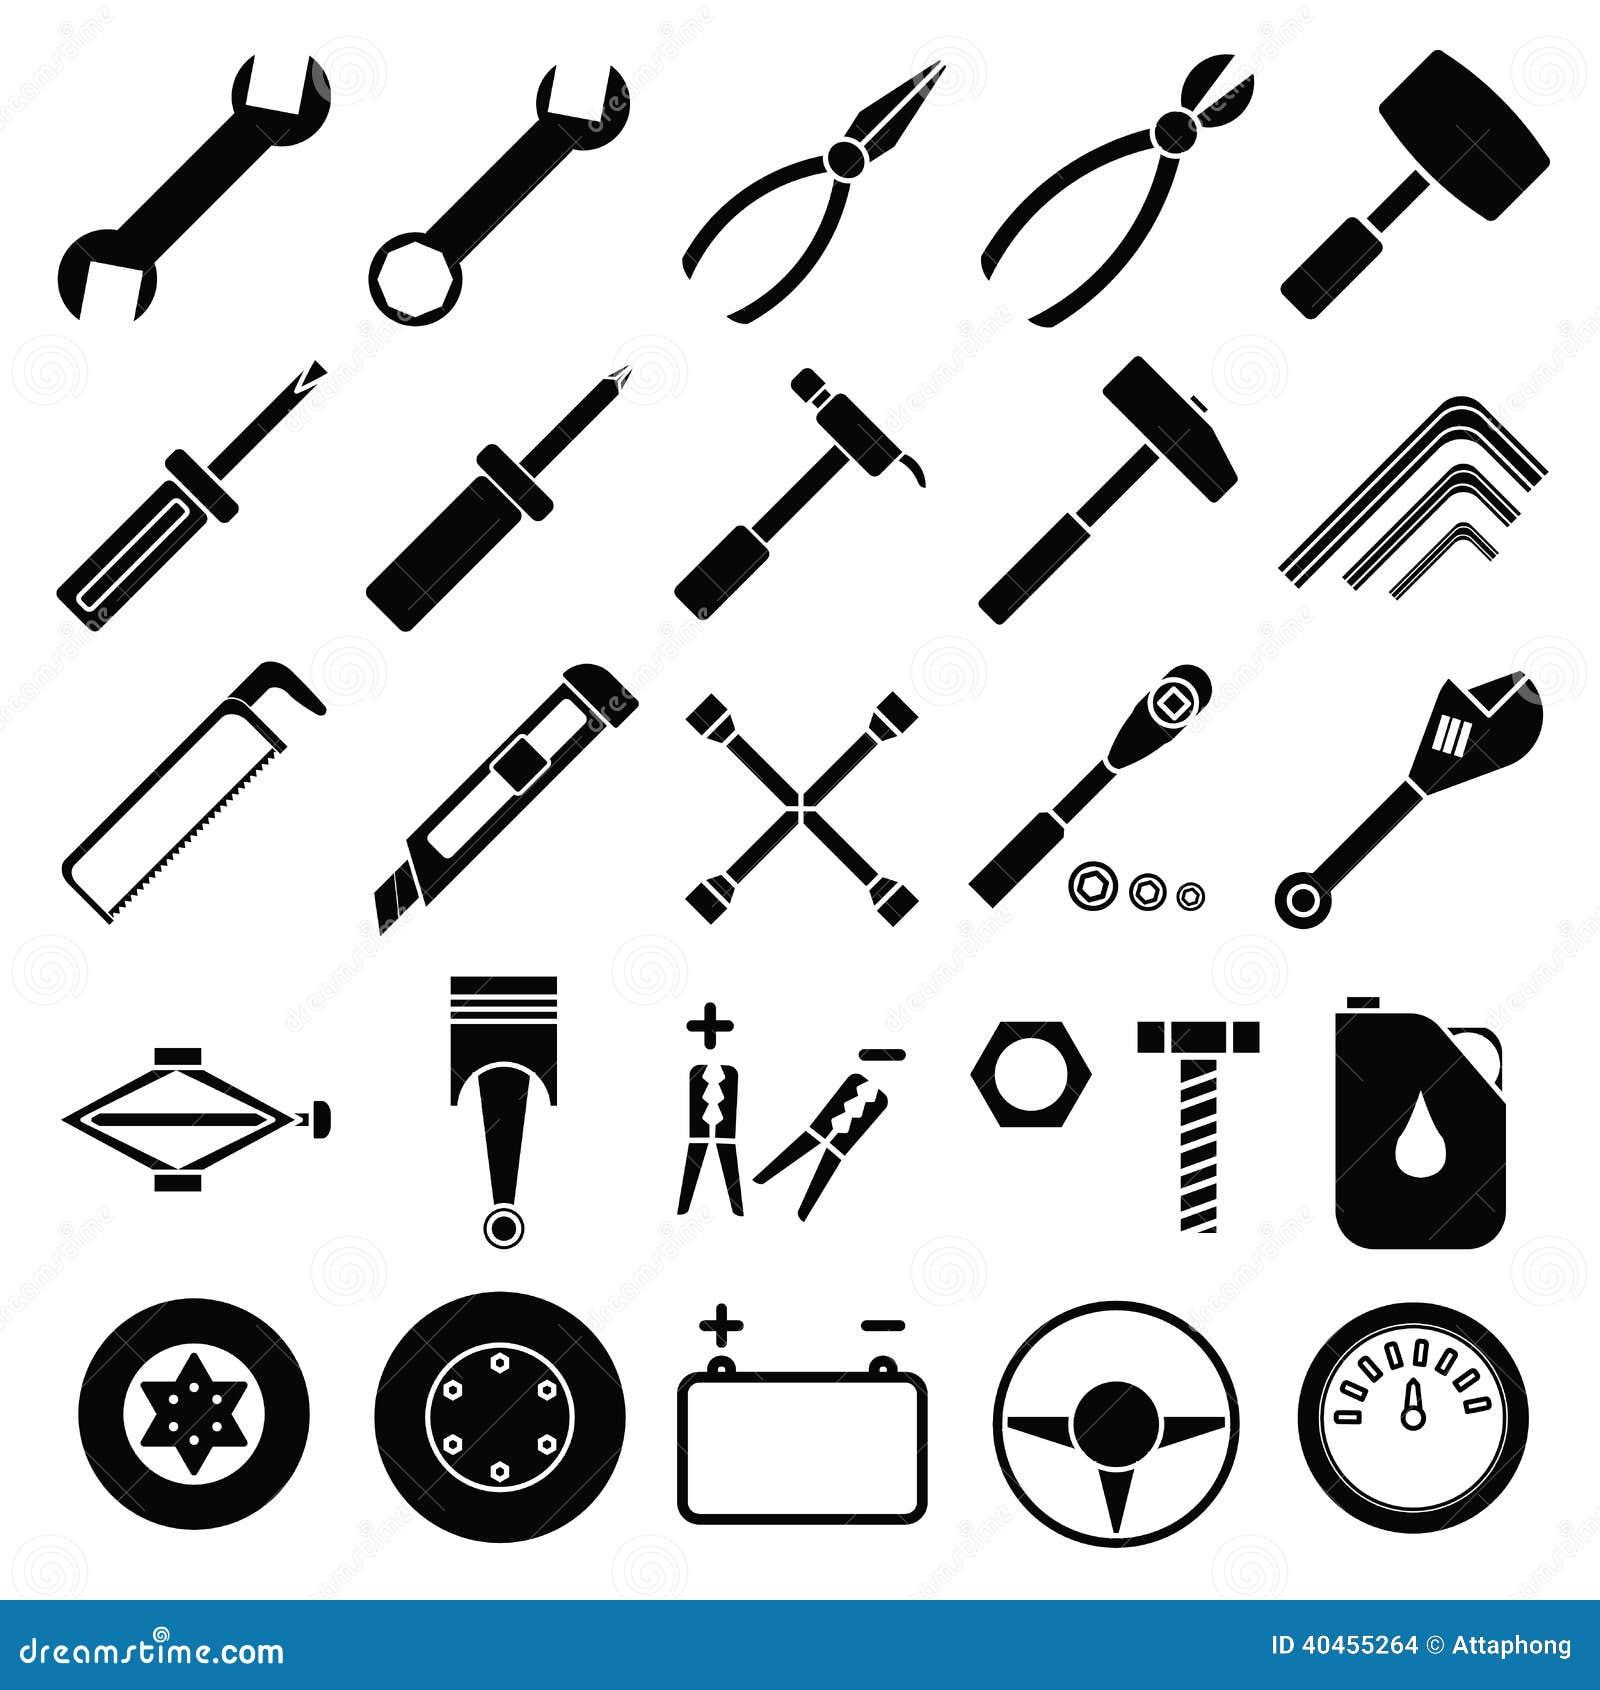 Auto Mechanic Tools Set Vector Stock Vector - Image: 40455264